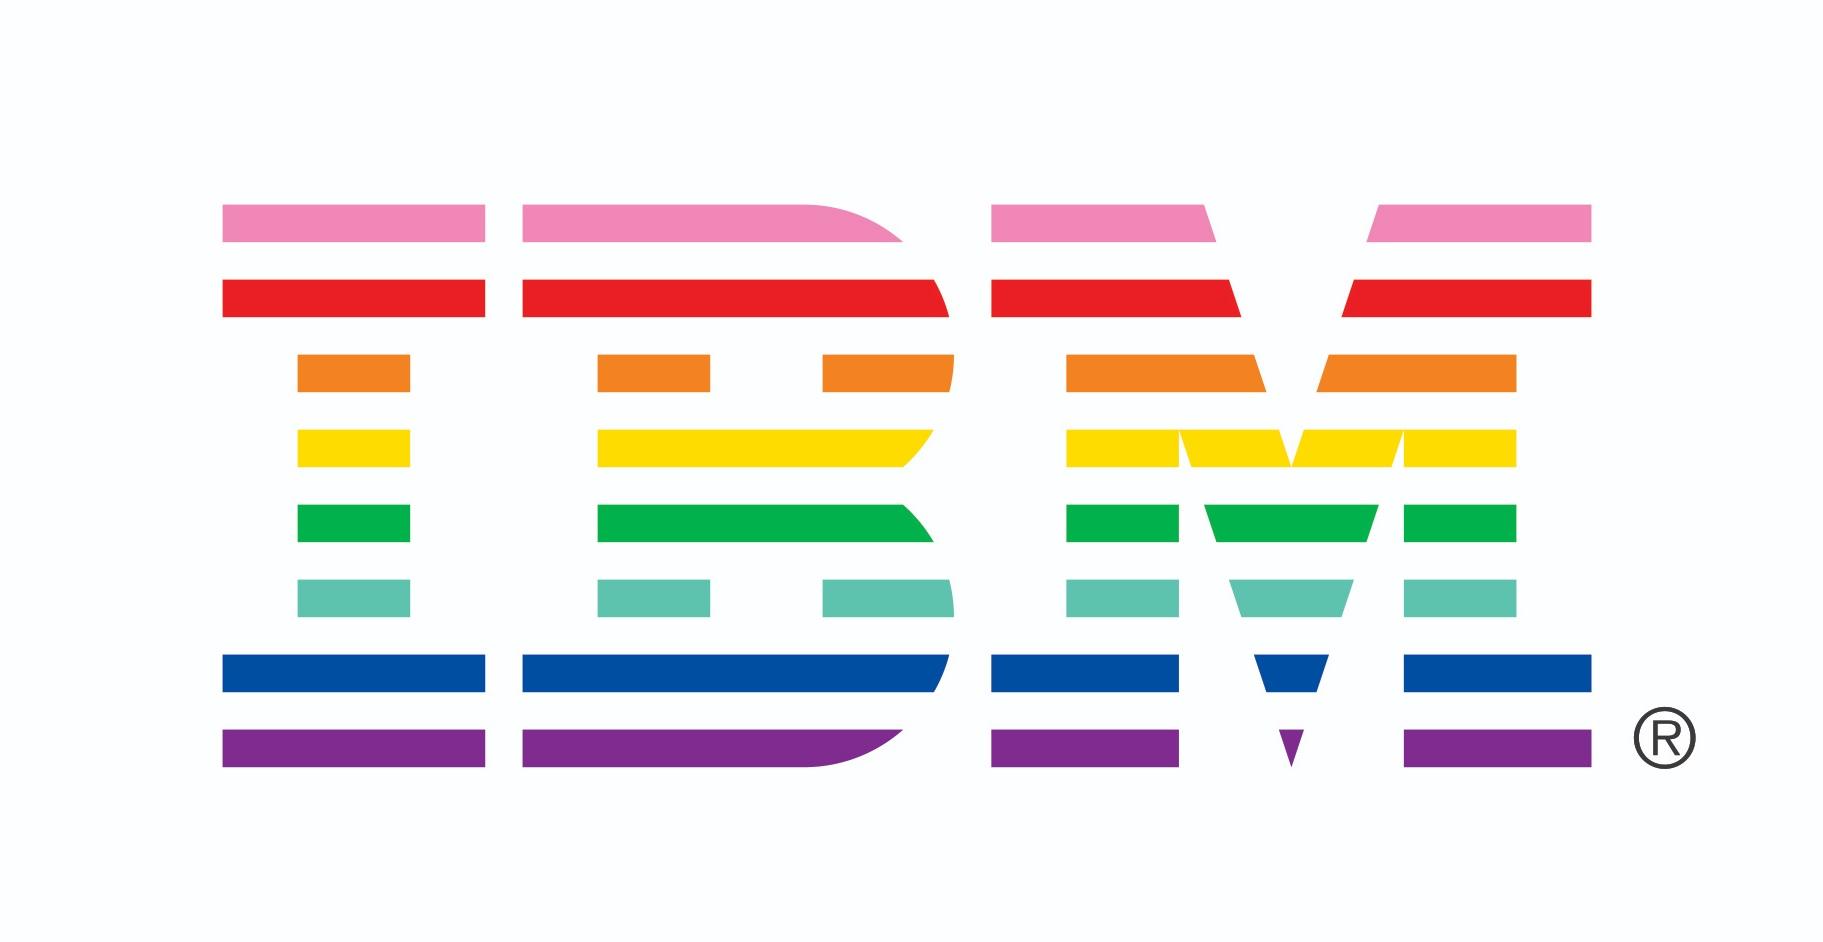 IBM_LGBT_logo%C2%AE_CMYK_XXL_2494x1688.jpg